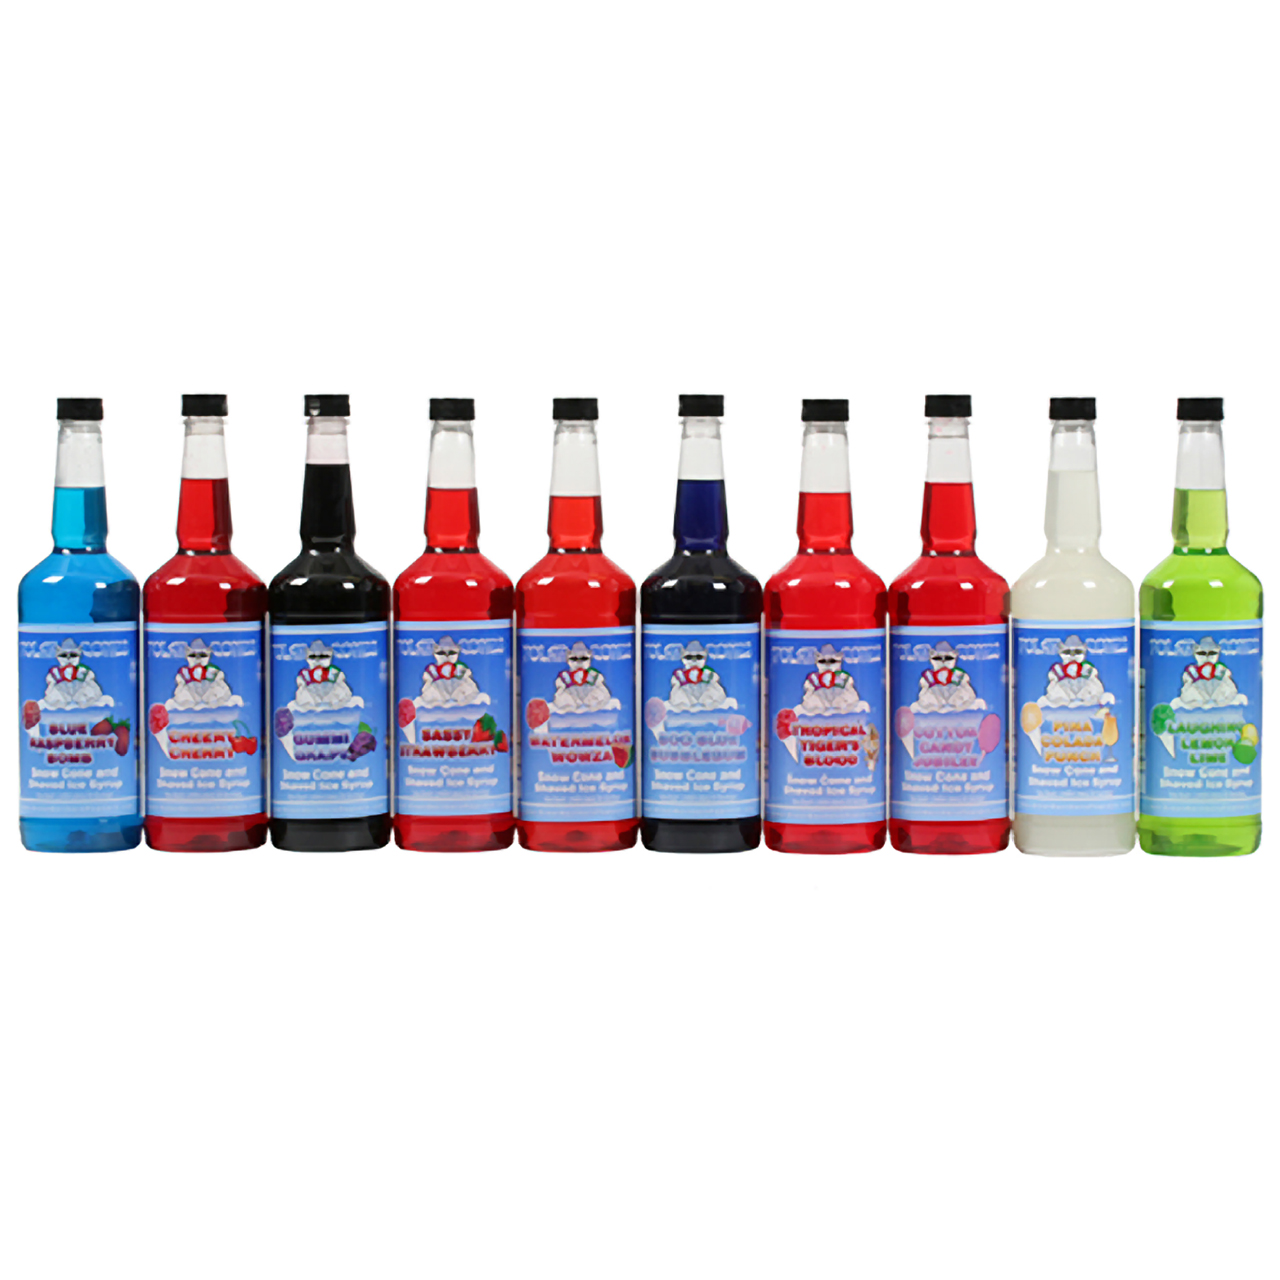 Polar Cones Premium 10 Flavor Combo Snow Cone & Shaved Ice Syrup ...